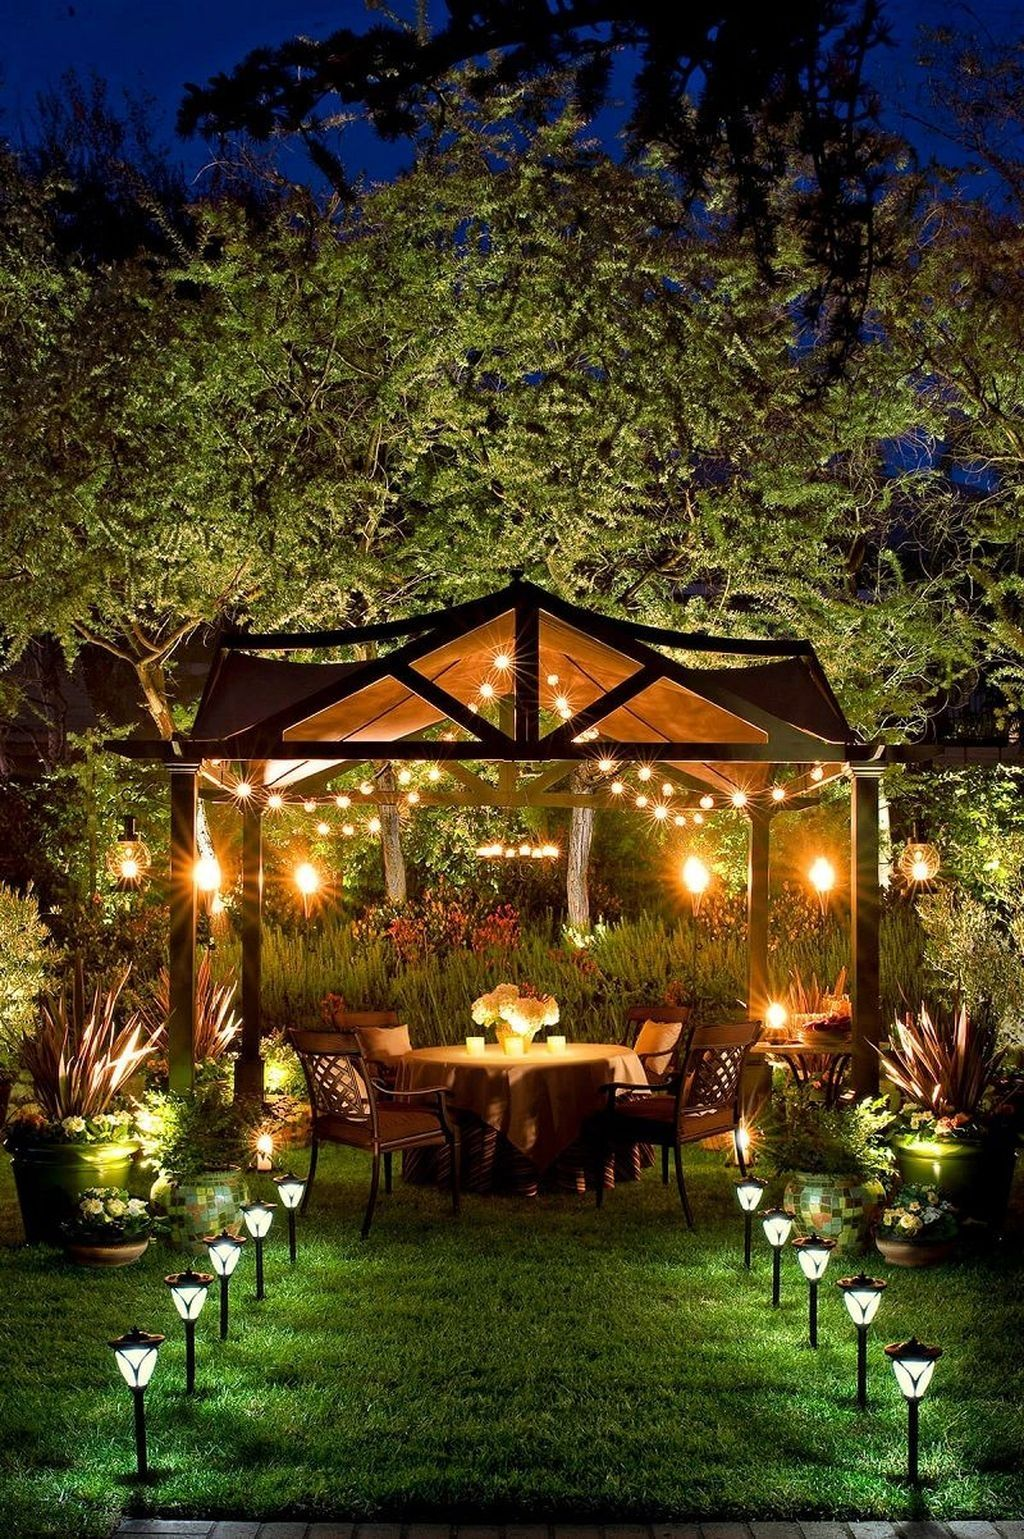 40 Cute Outdoor Lighting Ideas For Garden In 2020 Gazebo Lighting Backyard Lighting Backyard Pergola